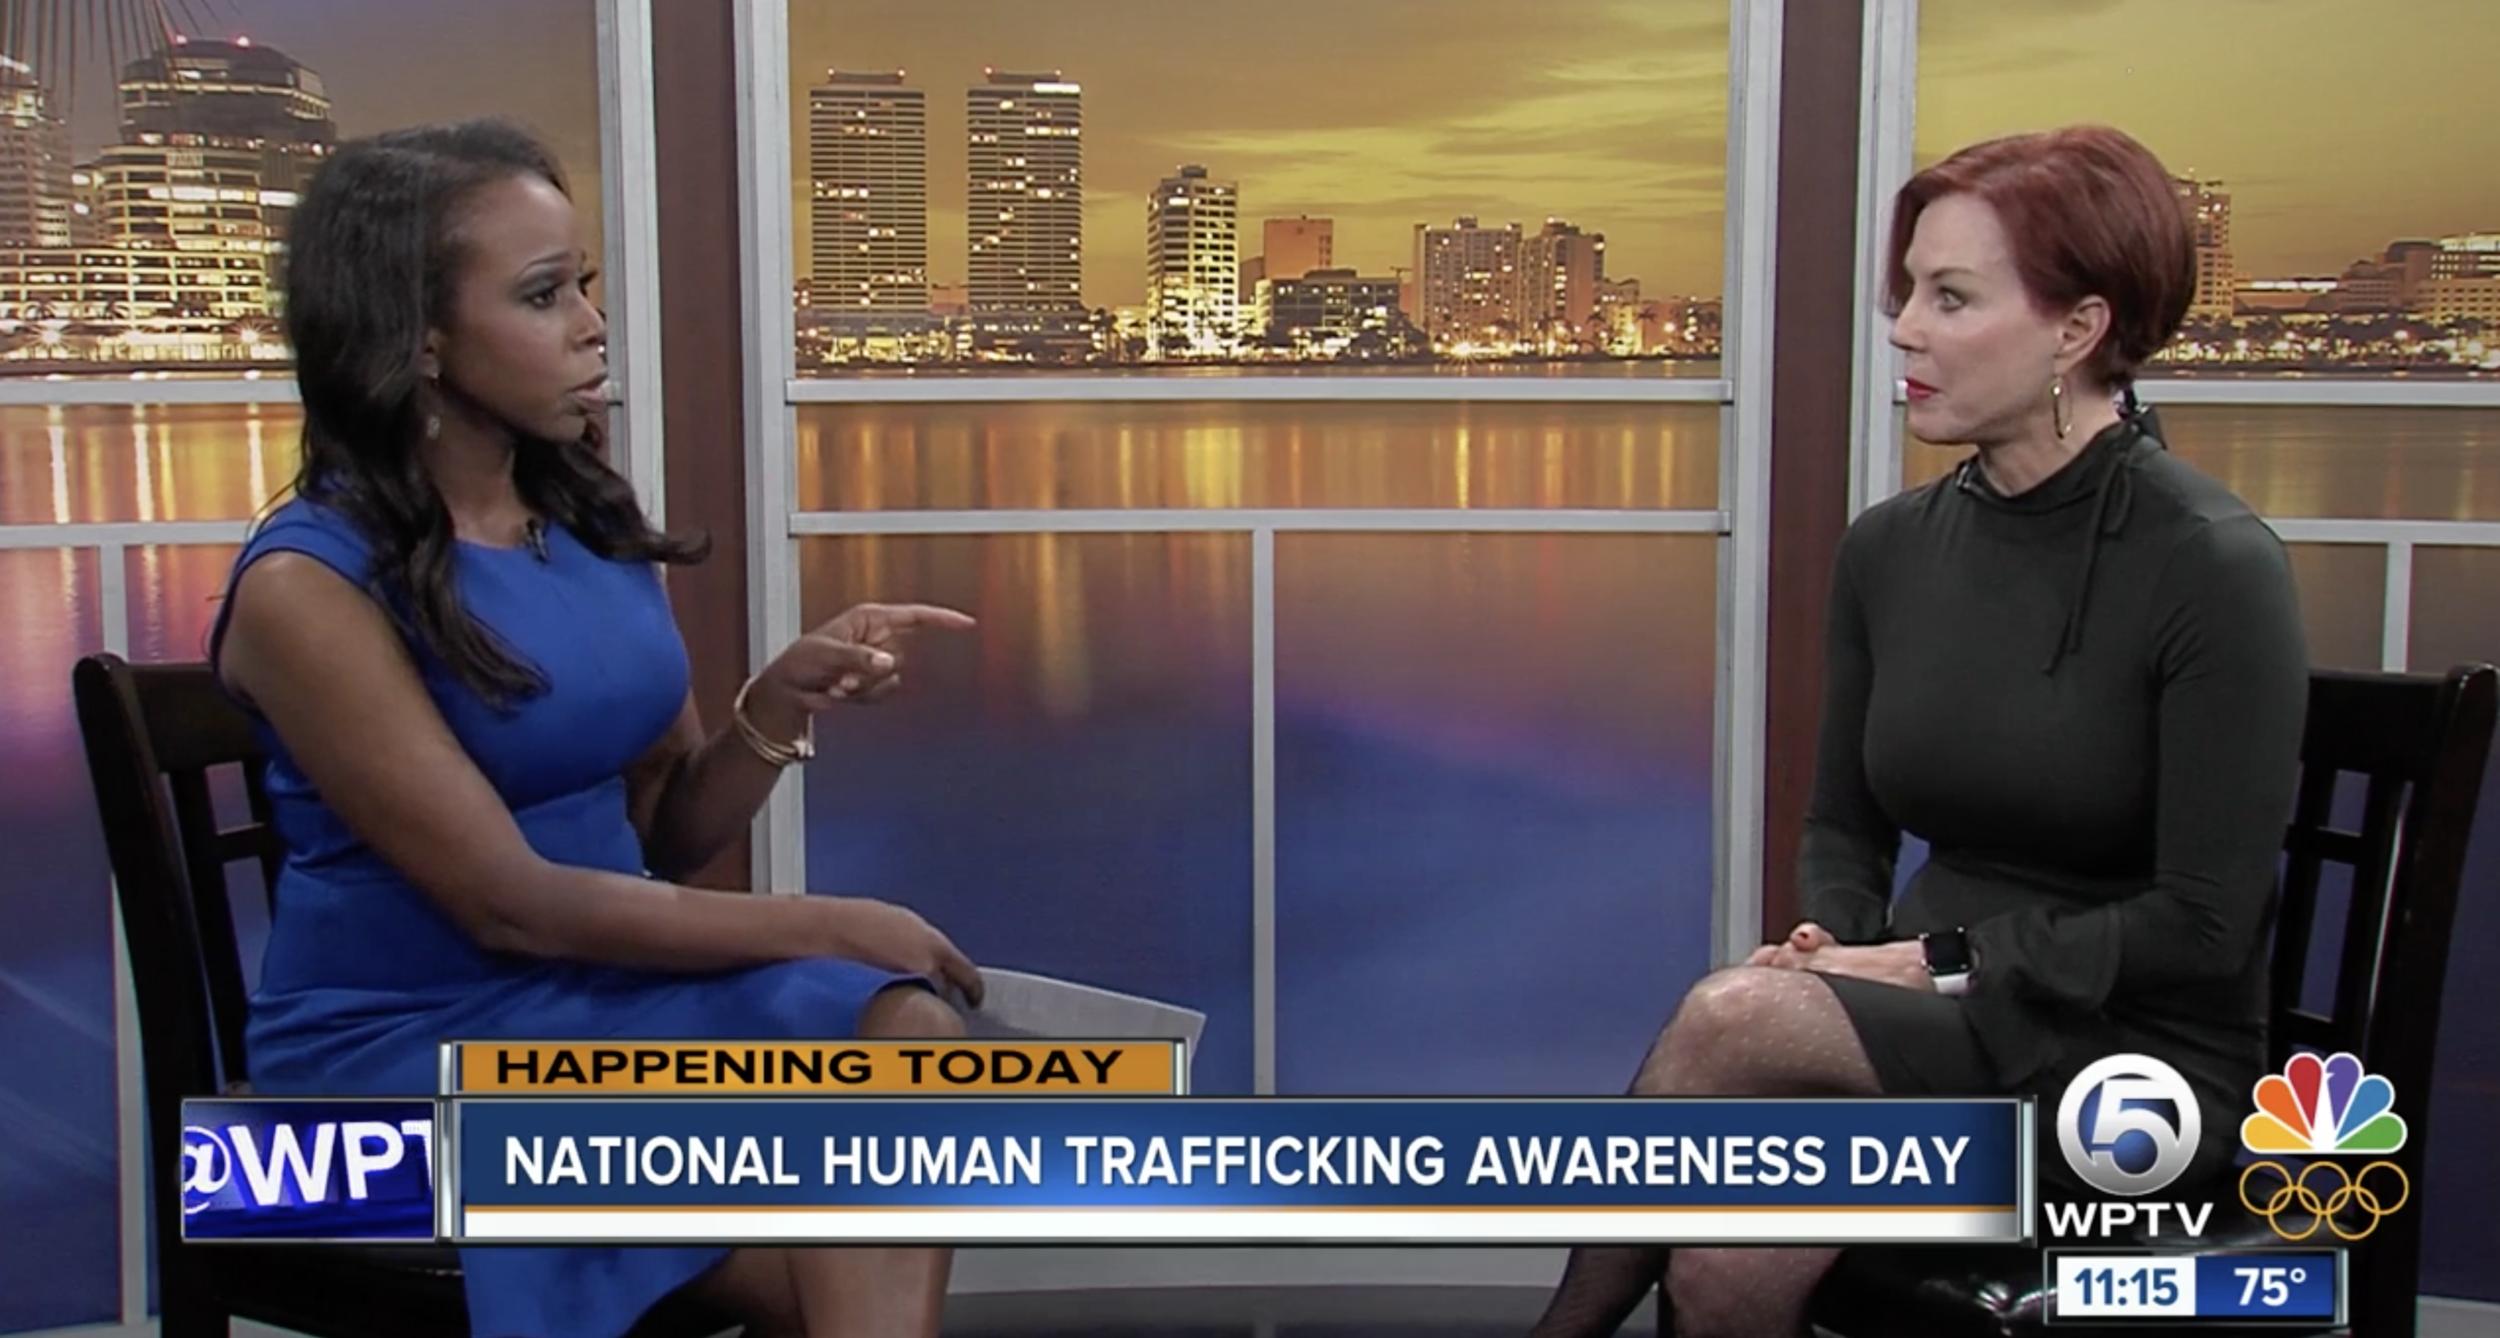 Press/Media — Catch the Wave of Hope — Abolish Human Trafficking